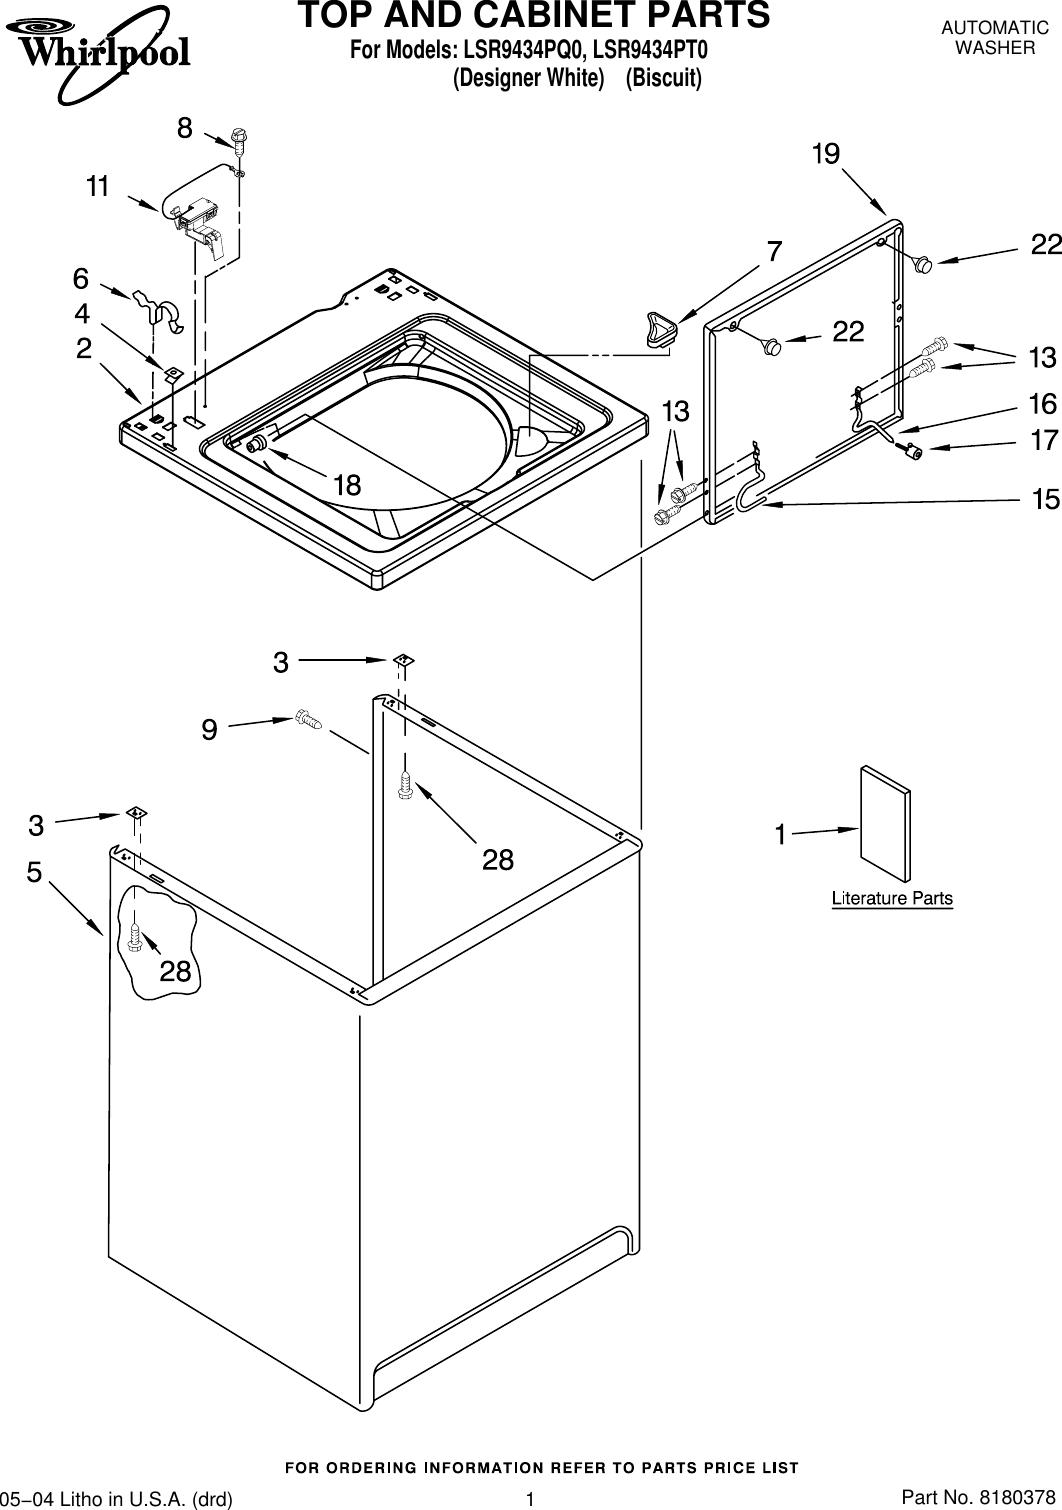 Whirlpool Lsr9434Pq0 Users Manual